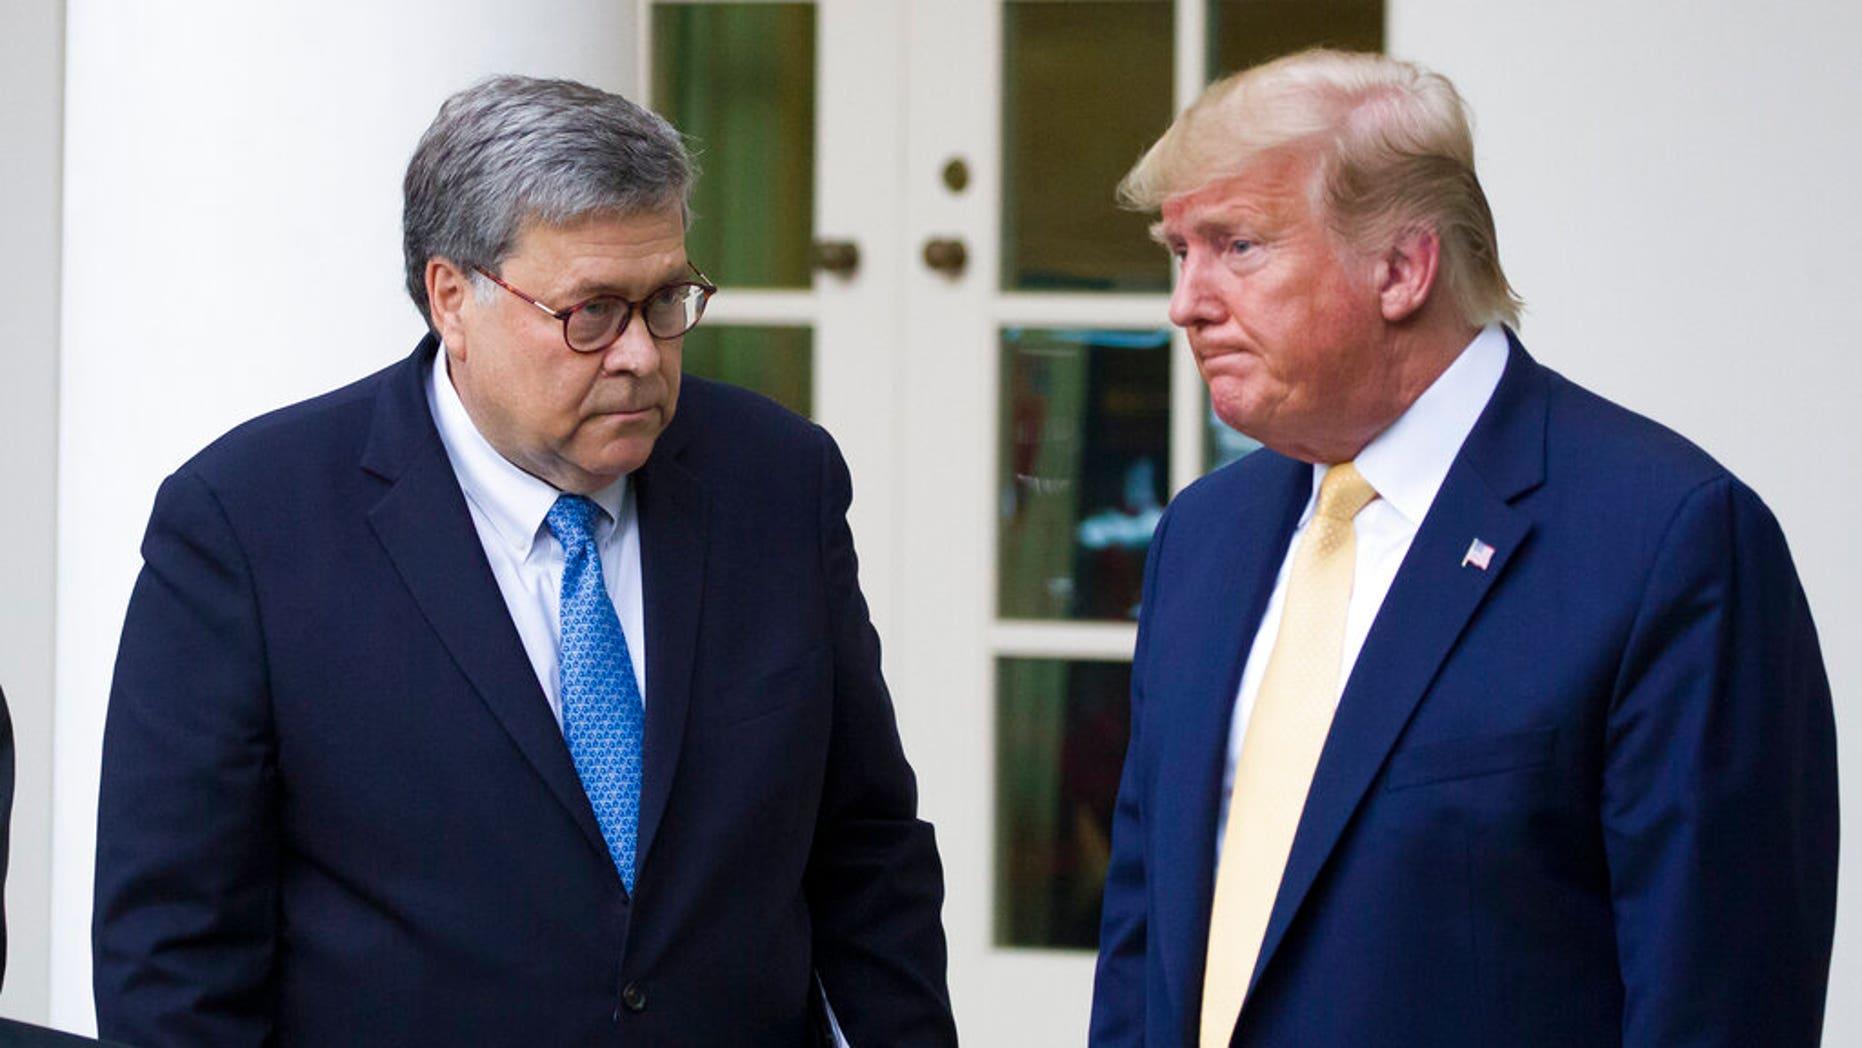 Attorney General William Barr and President Trump (AP Photo/Alex Brandon, File)